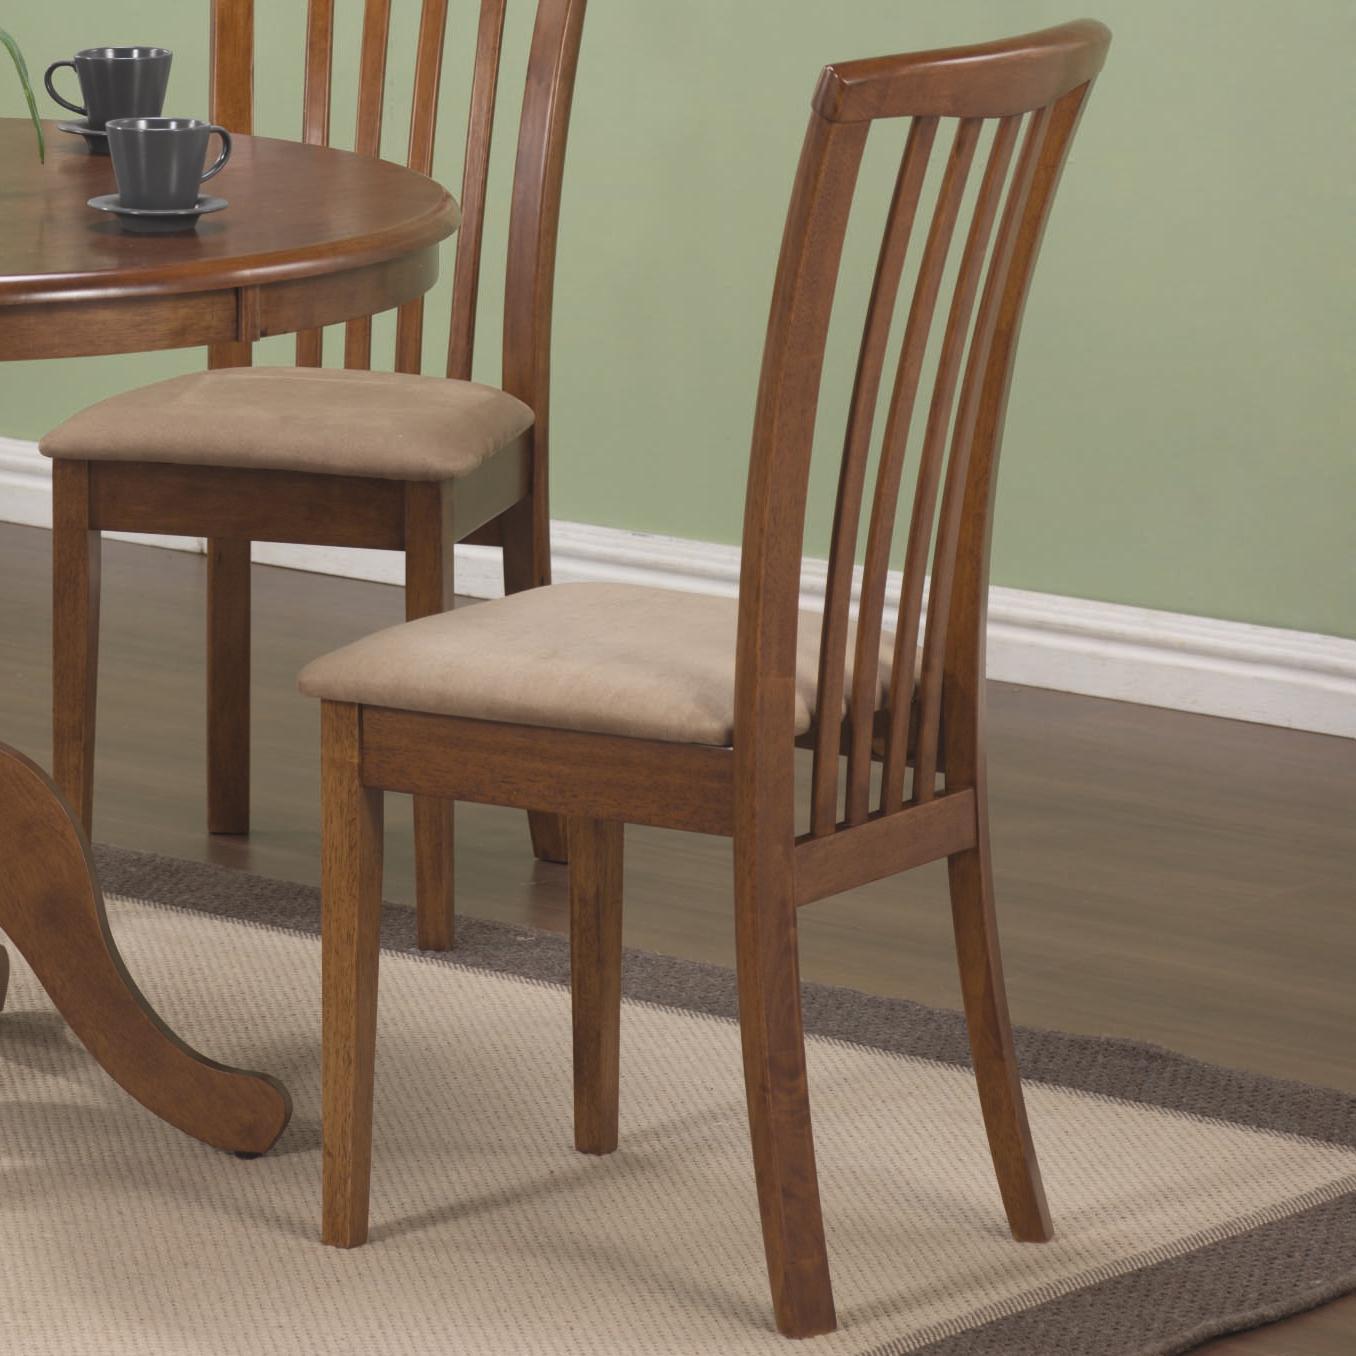 Brannan Slat Back Side Chair by Coaster at Lapeer Furniture & Mattress Center